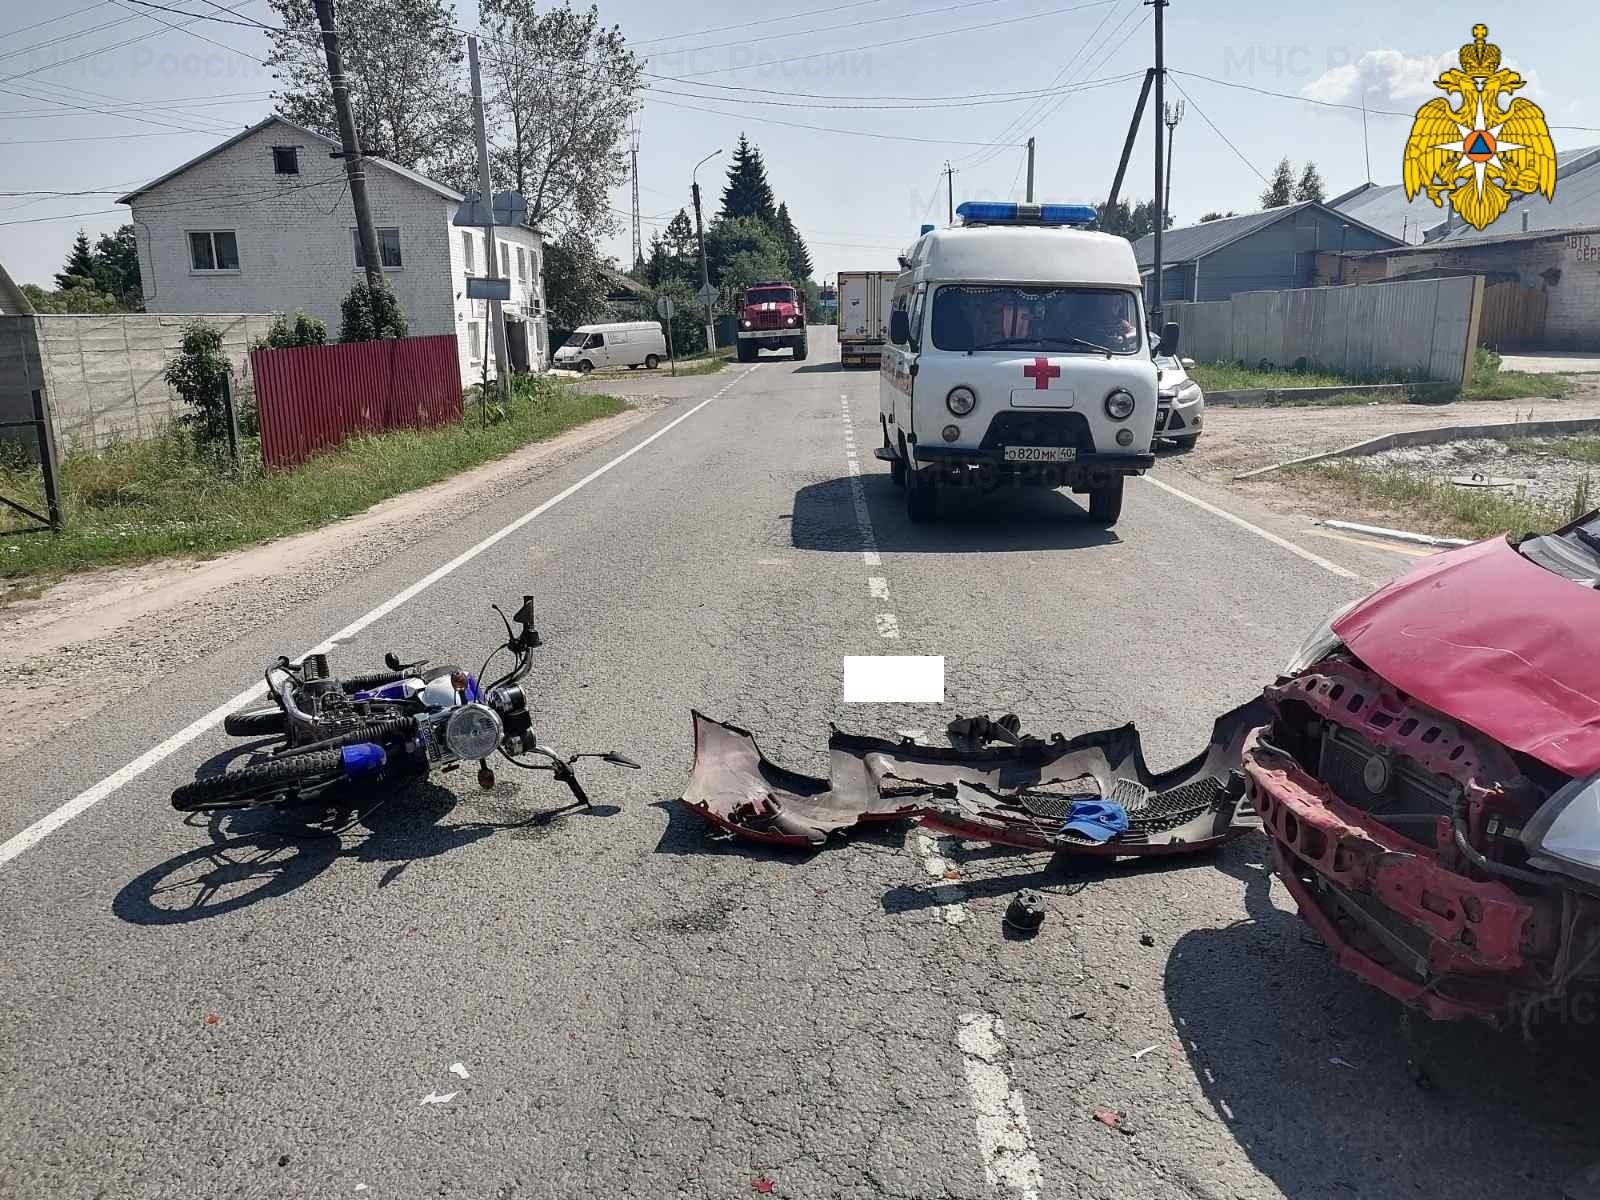 Спасатели МЧС принимали участие в ликвидации ДТП в п. Ферзиково, ул. Ленина